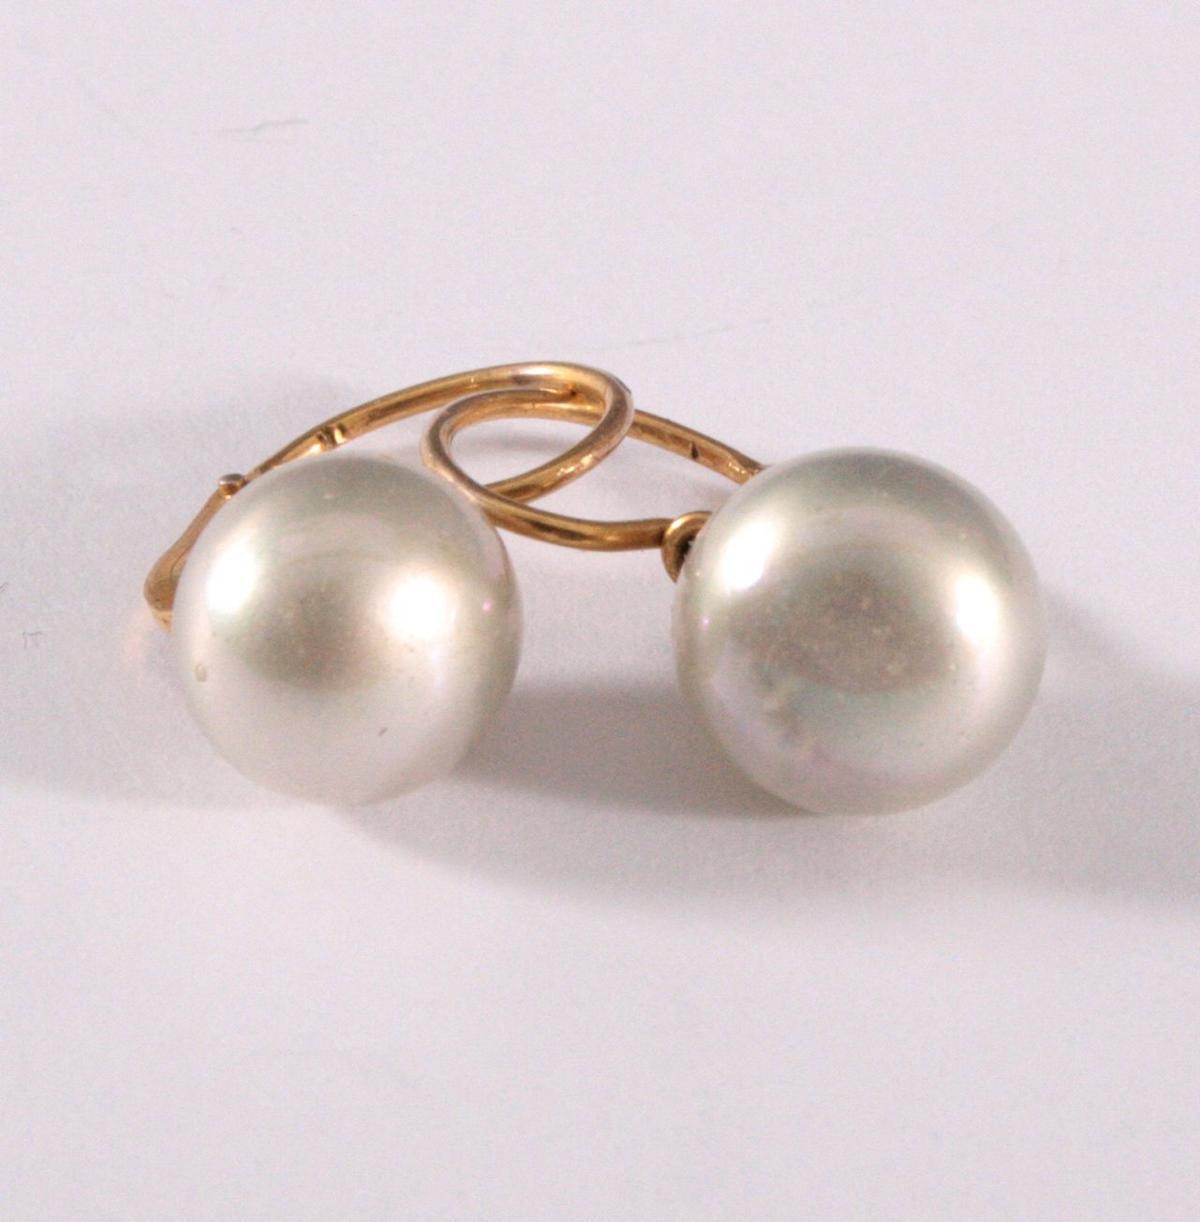 Paar antike Ohrringe mit Perlen